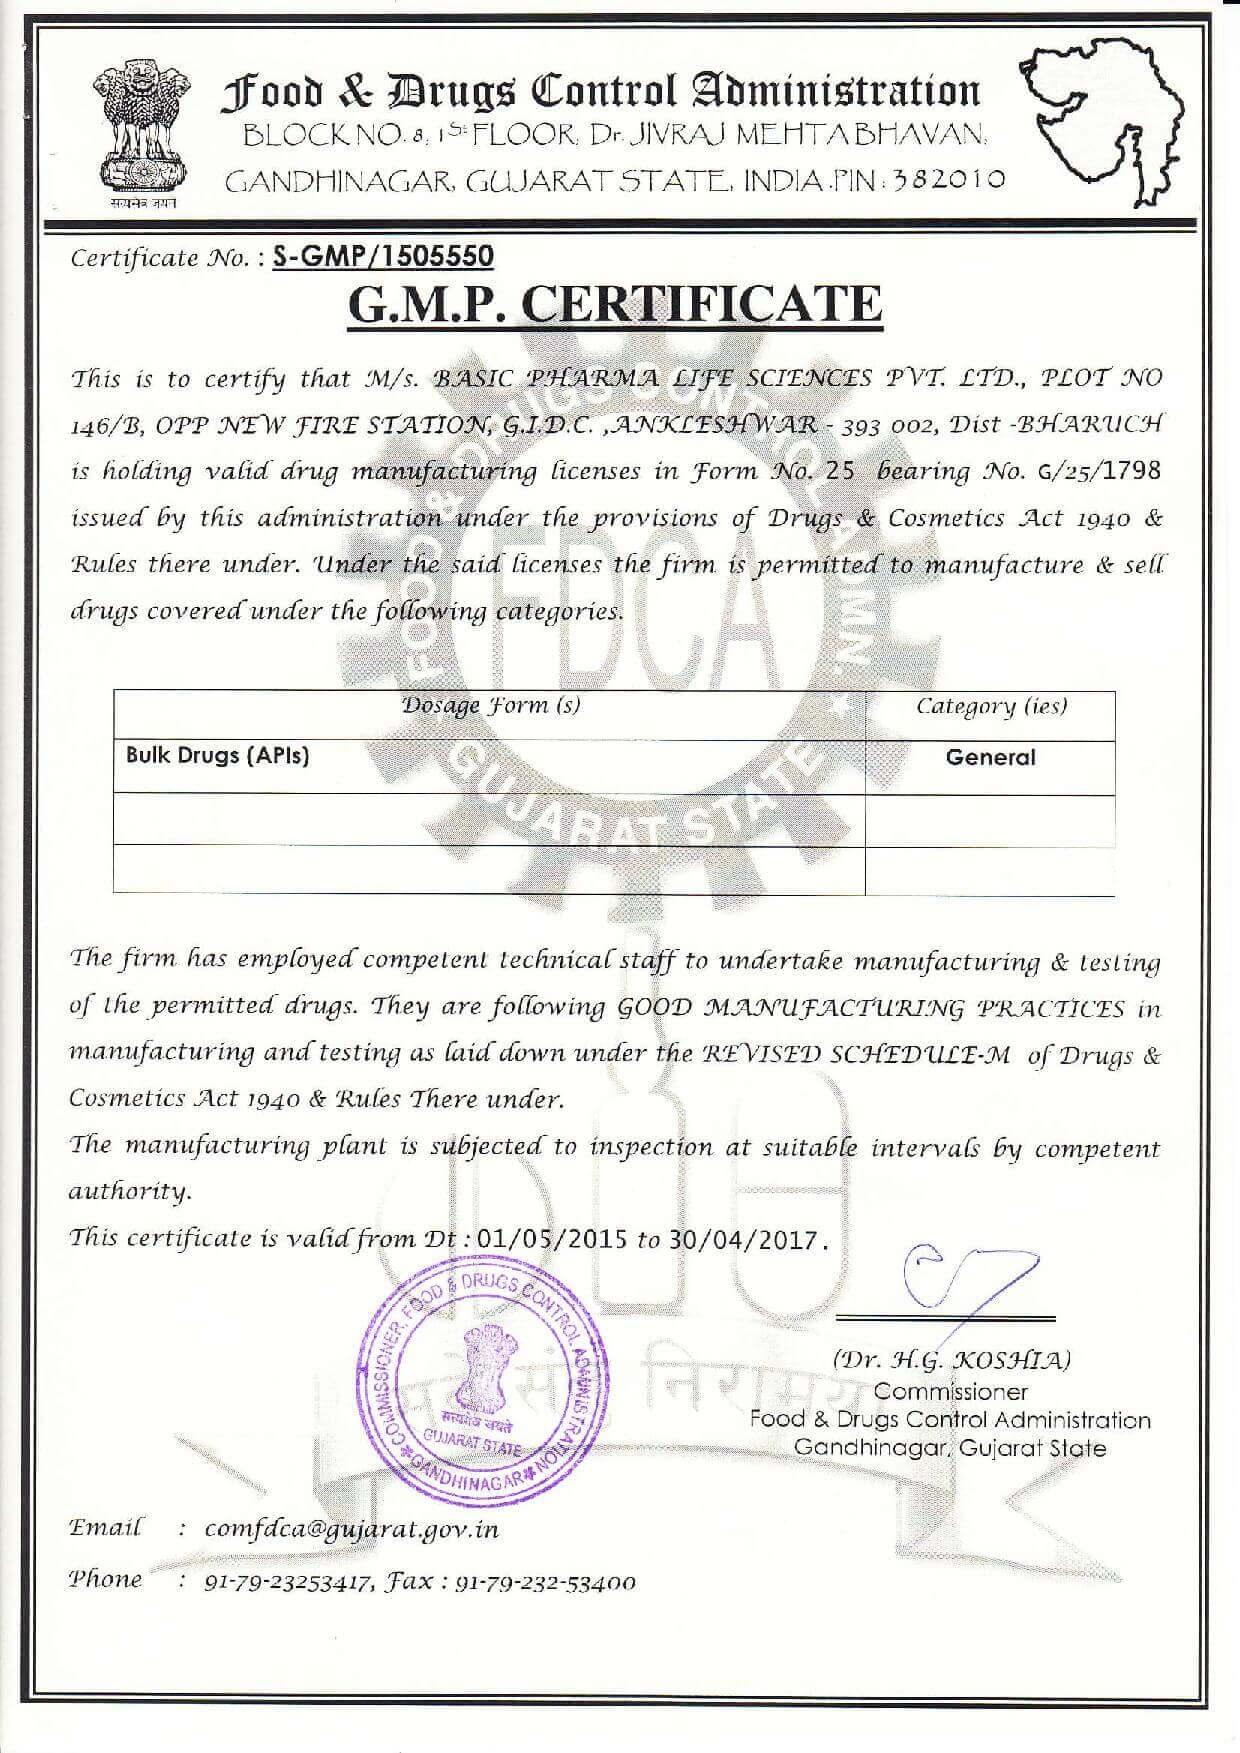 Certificates Of Basic Pharma